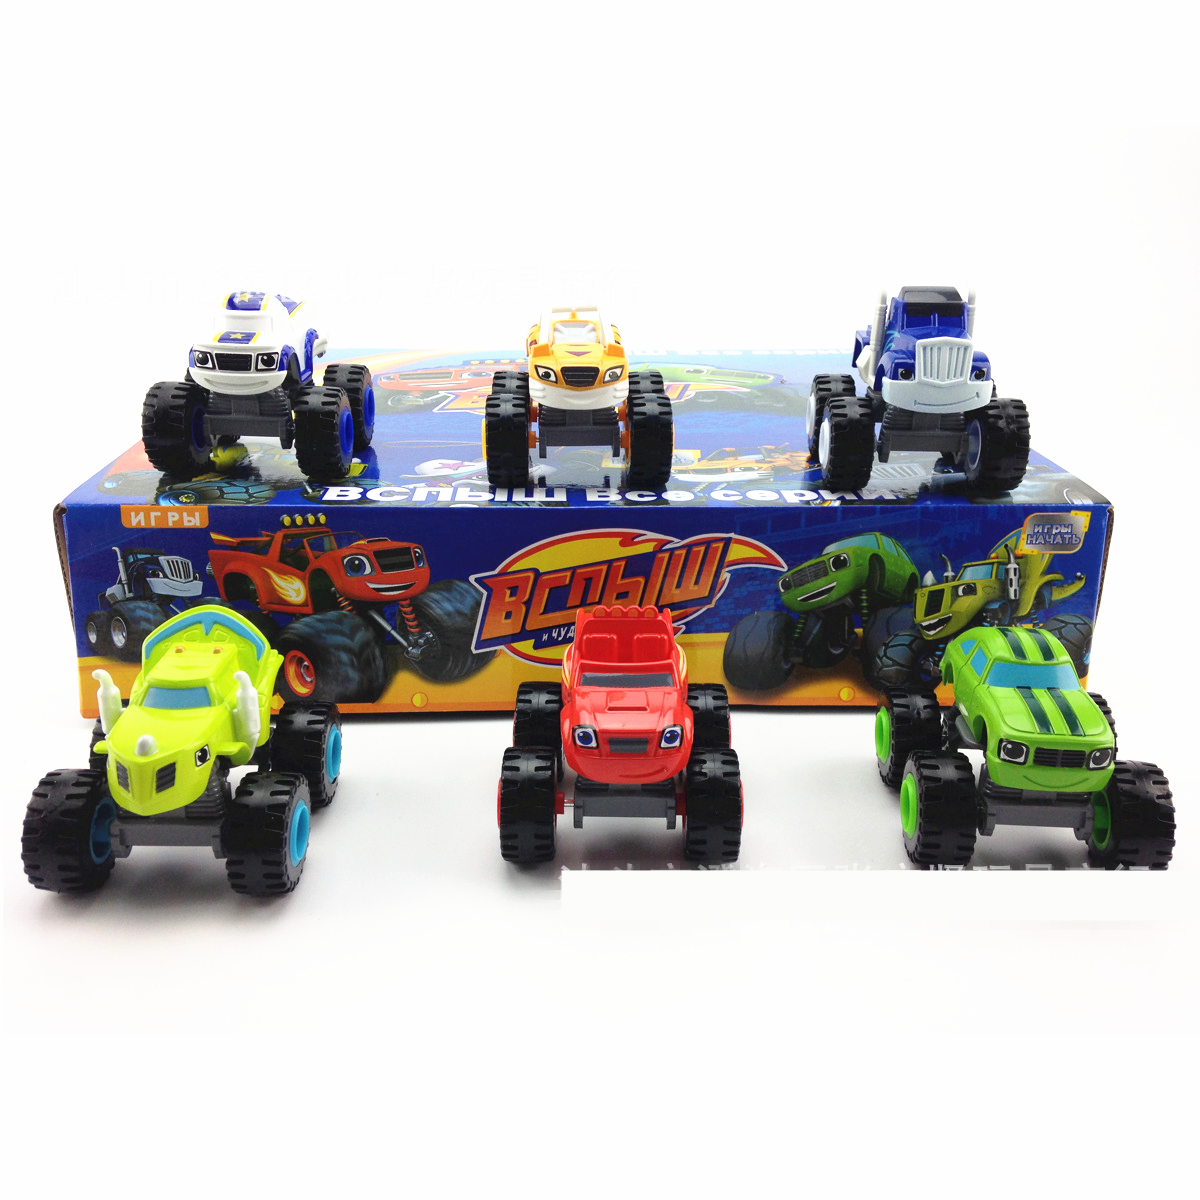 6pcs/set Blaze Monster Machines Vehicle Car Transformation ABS 7.5cm Toys Best Gifts Kids Promotion Sliding Birthday Christmas(China (Mainland))